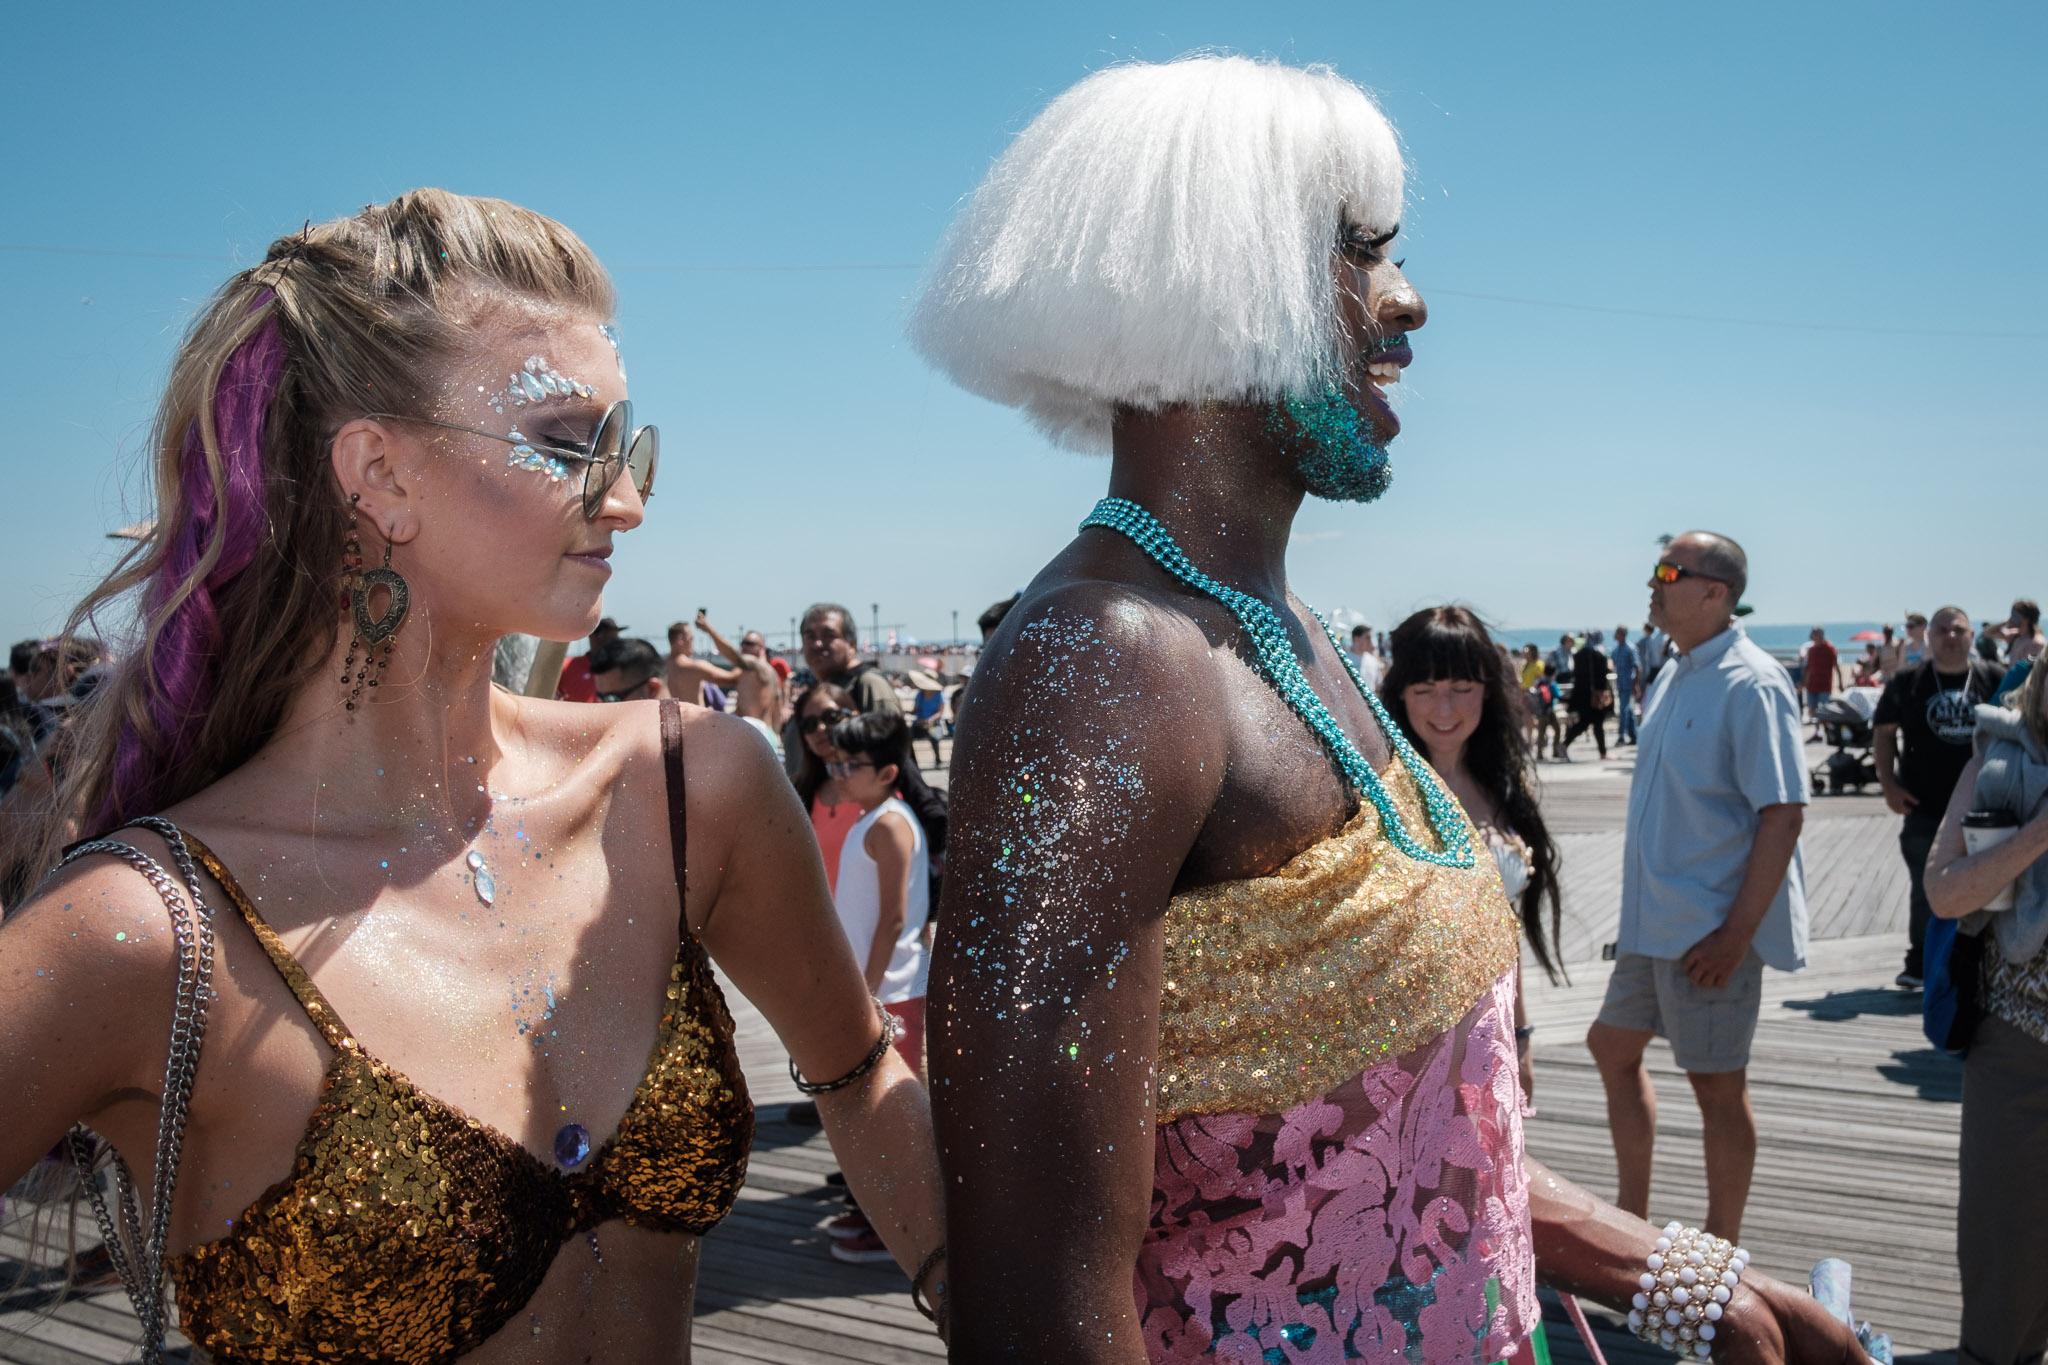 mermaidparade2018_014.jpg